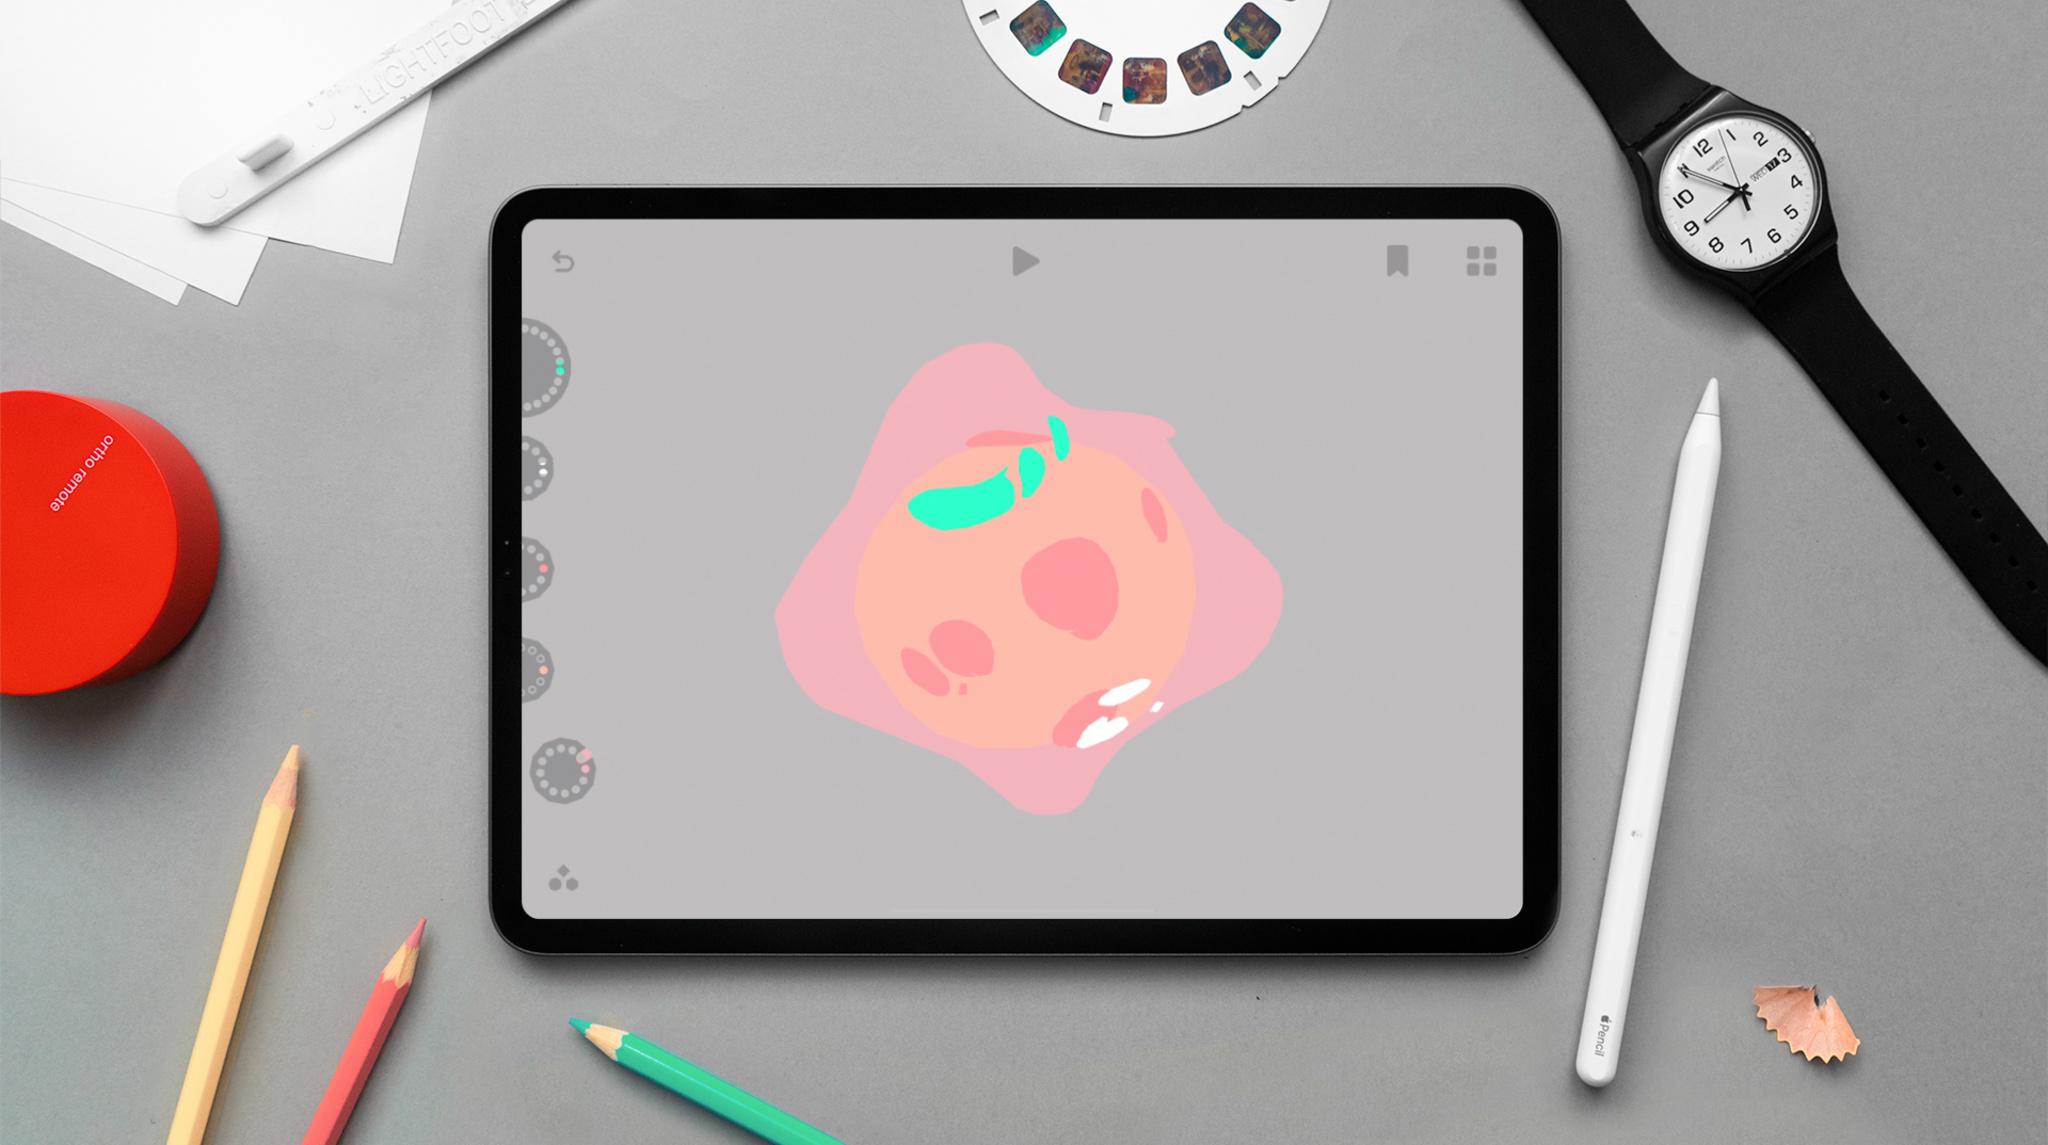 Loom animation on iPad with pencils surrounding it